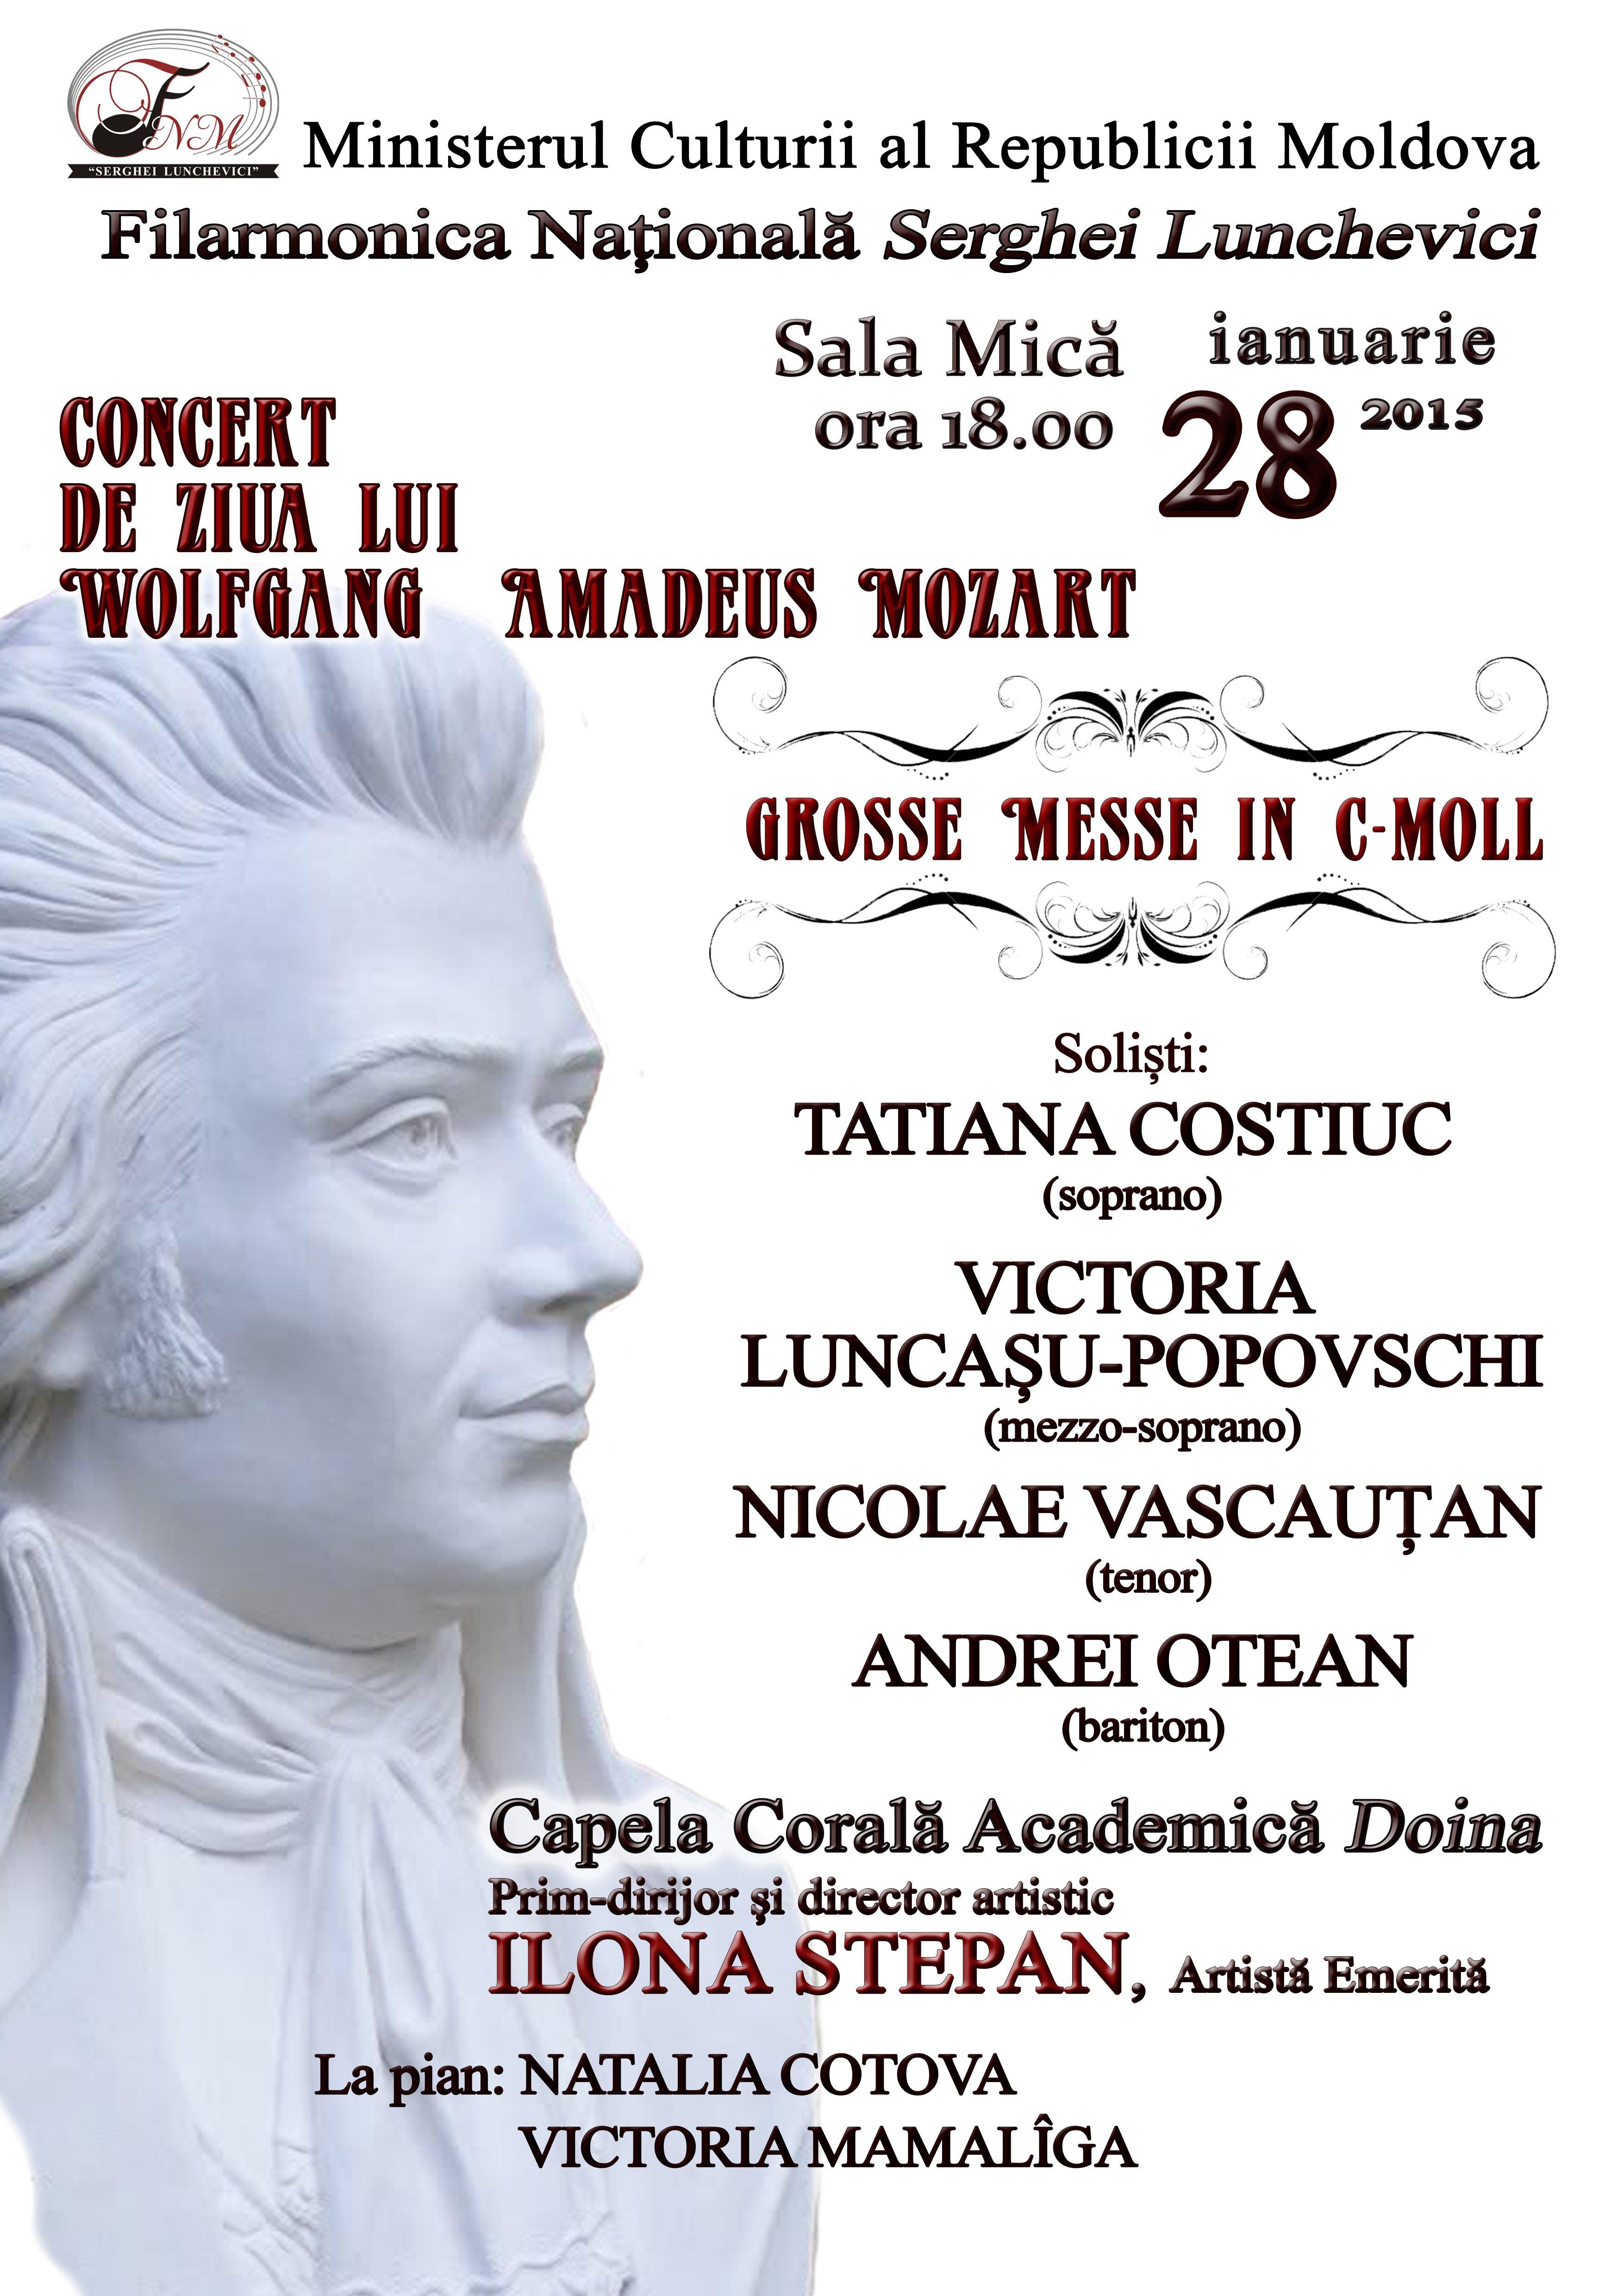 Concert de ziua lui W.A.Mozart